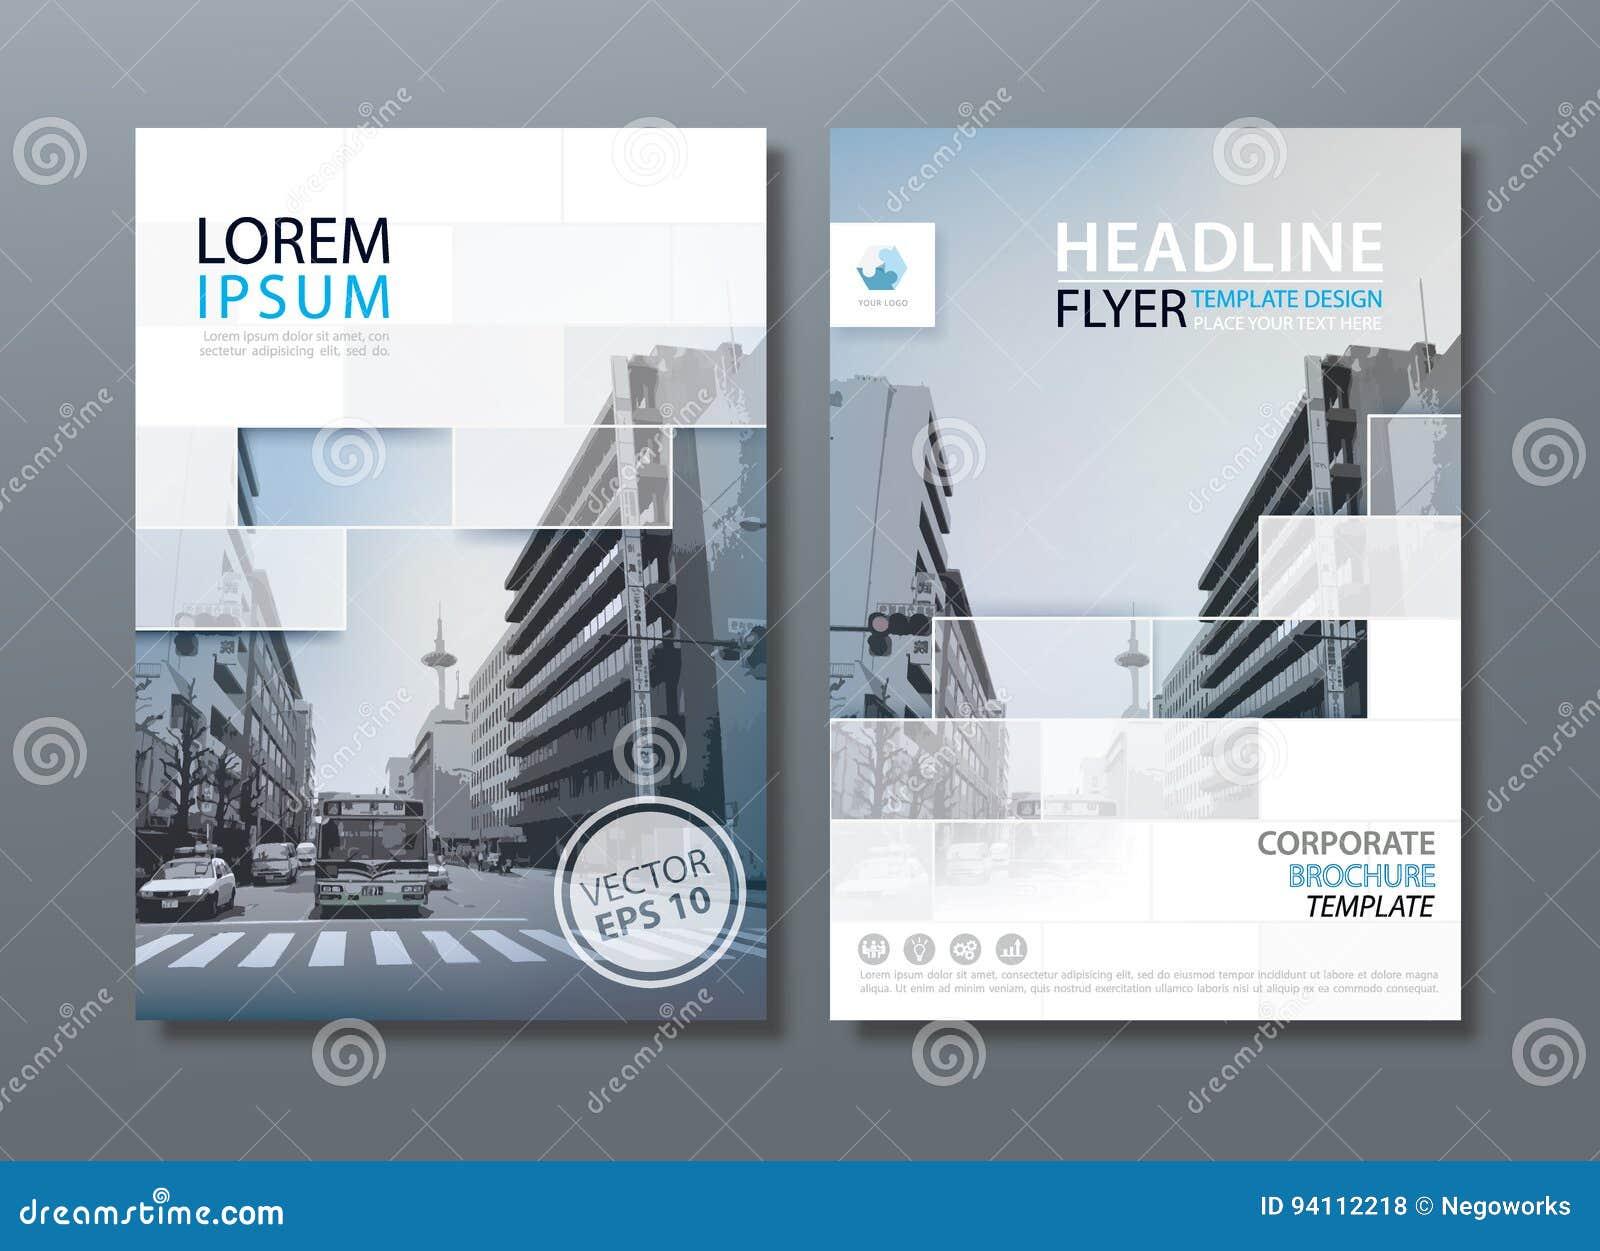 Flyer Design Template Vector Leaflet Book Cover Templates Stock